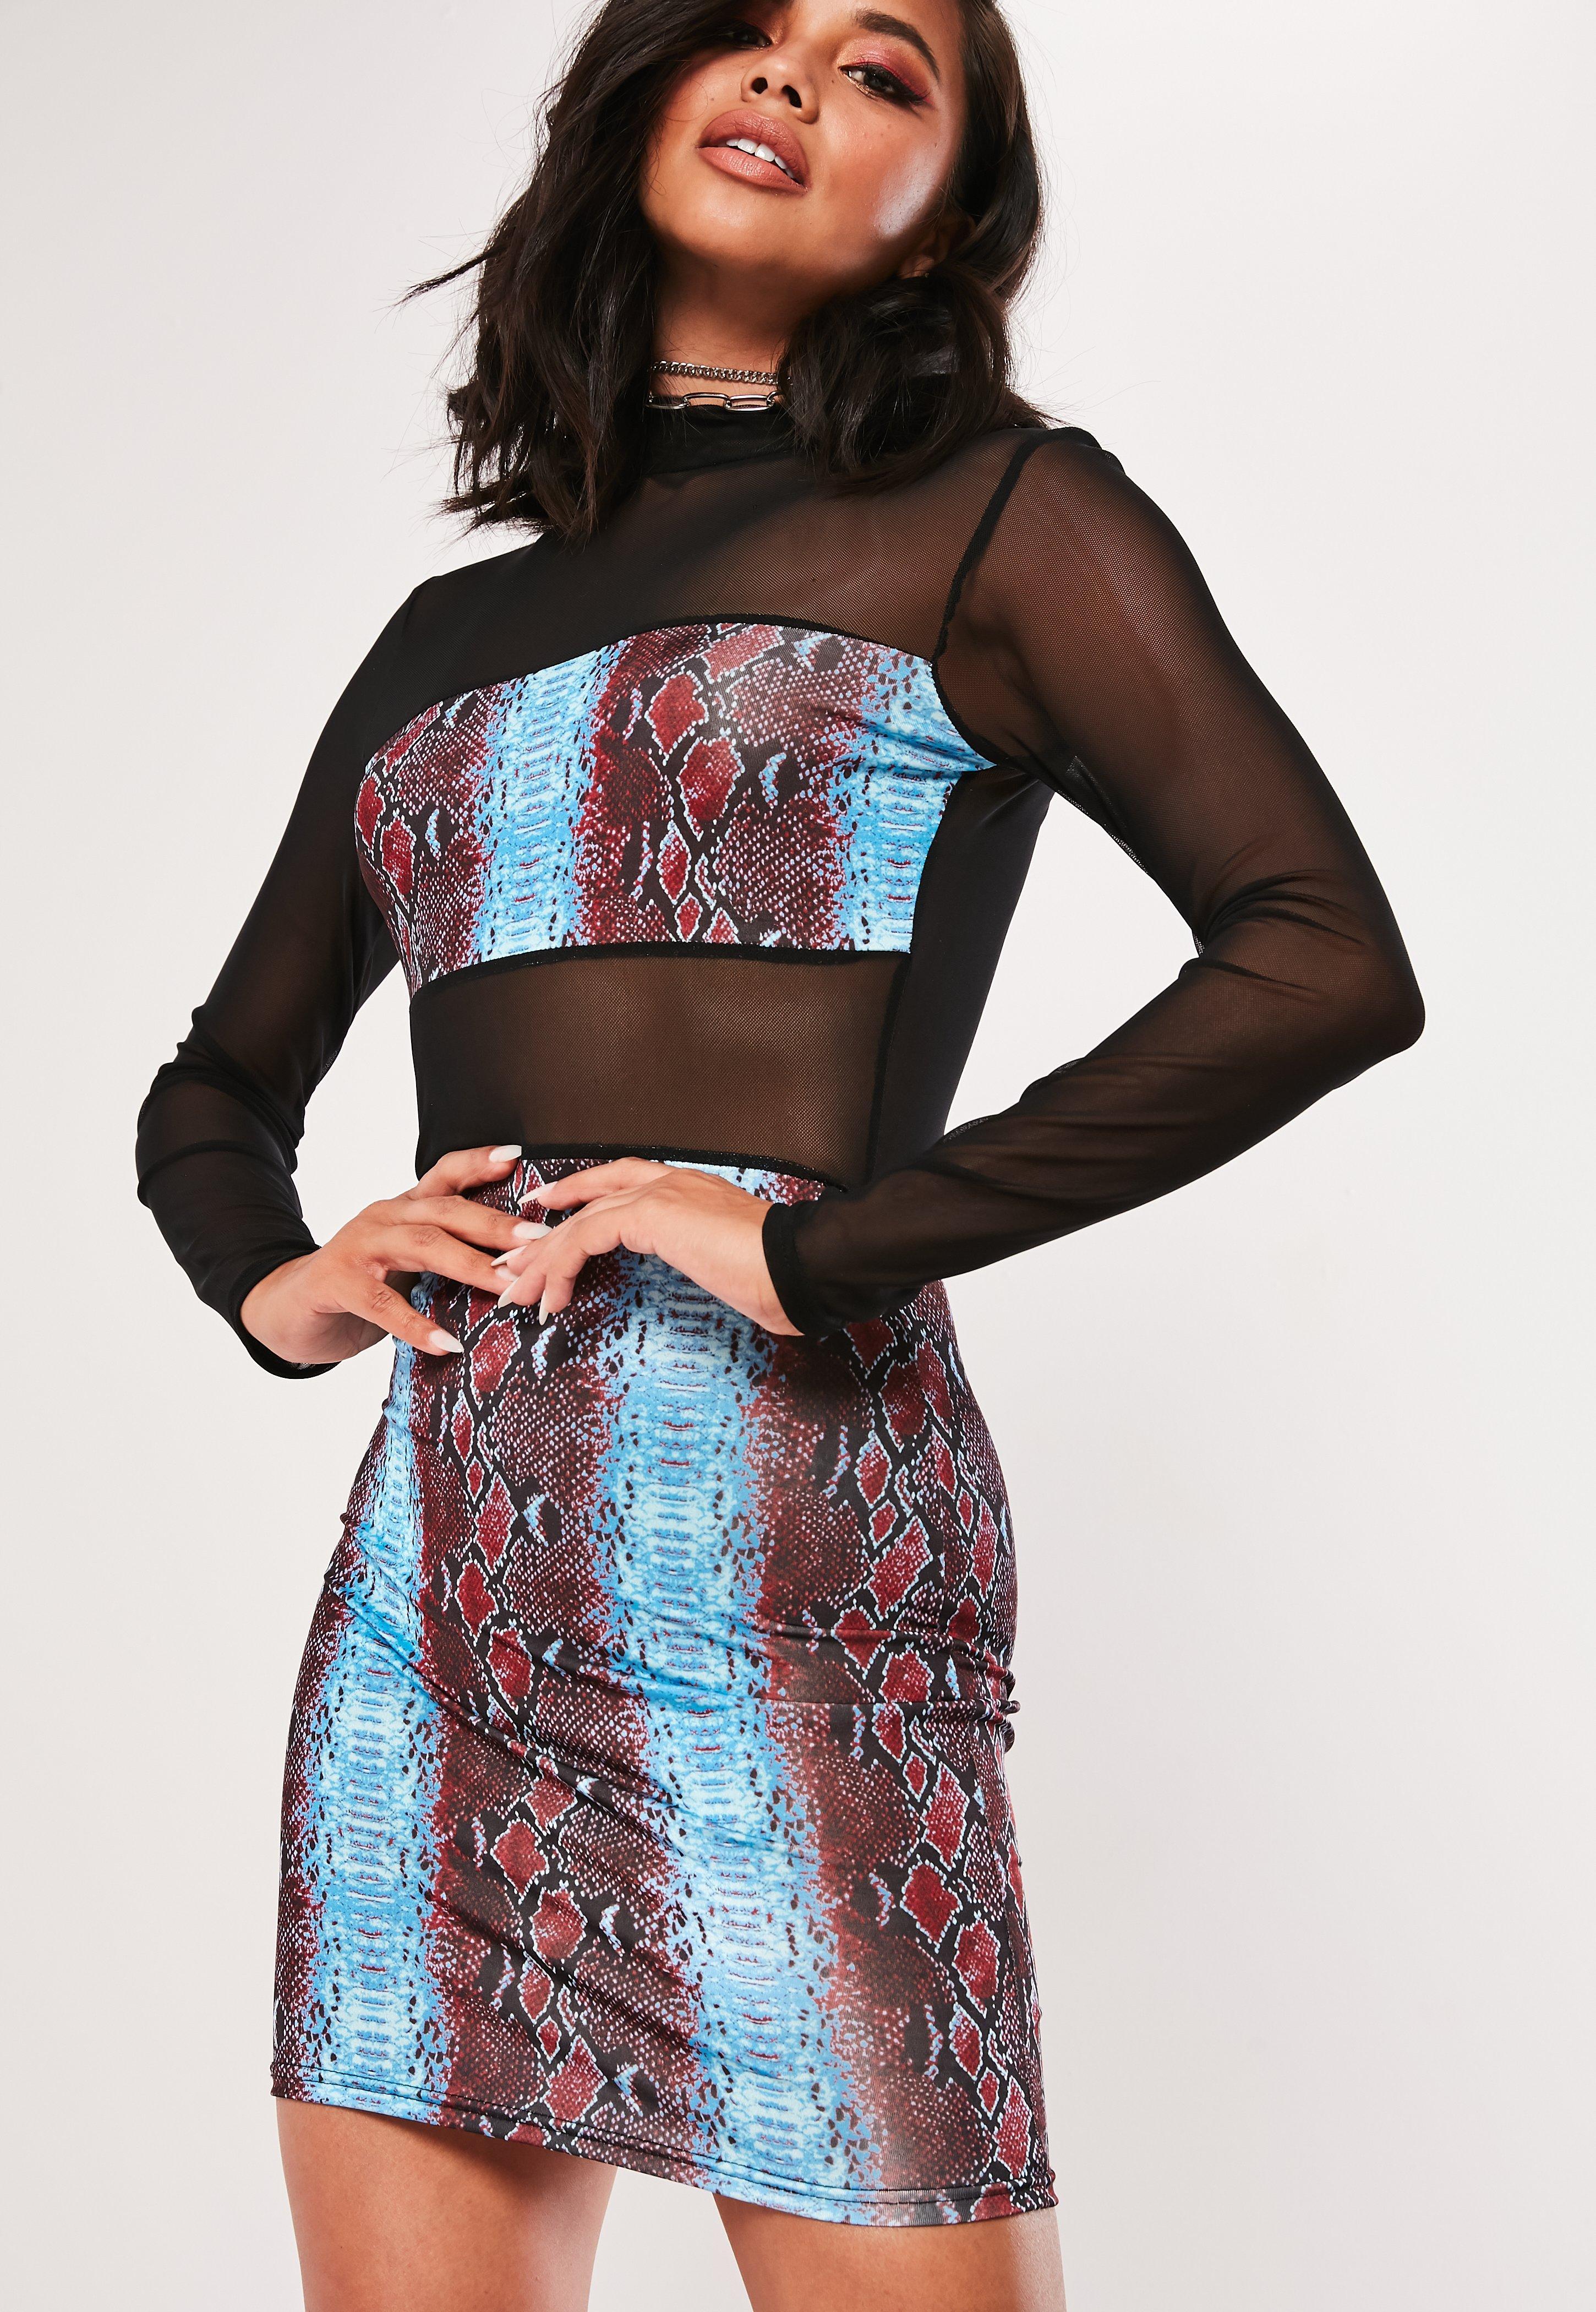 f2e42220b88 Snake Print Dresses   Tops – Snake Print Clothing